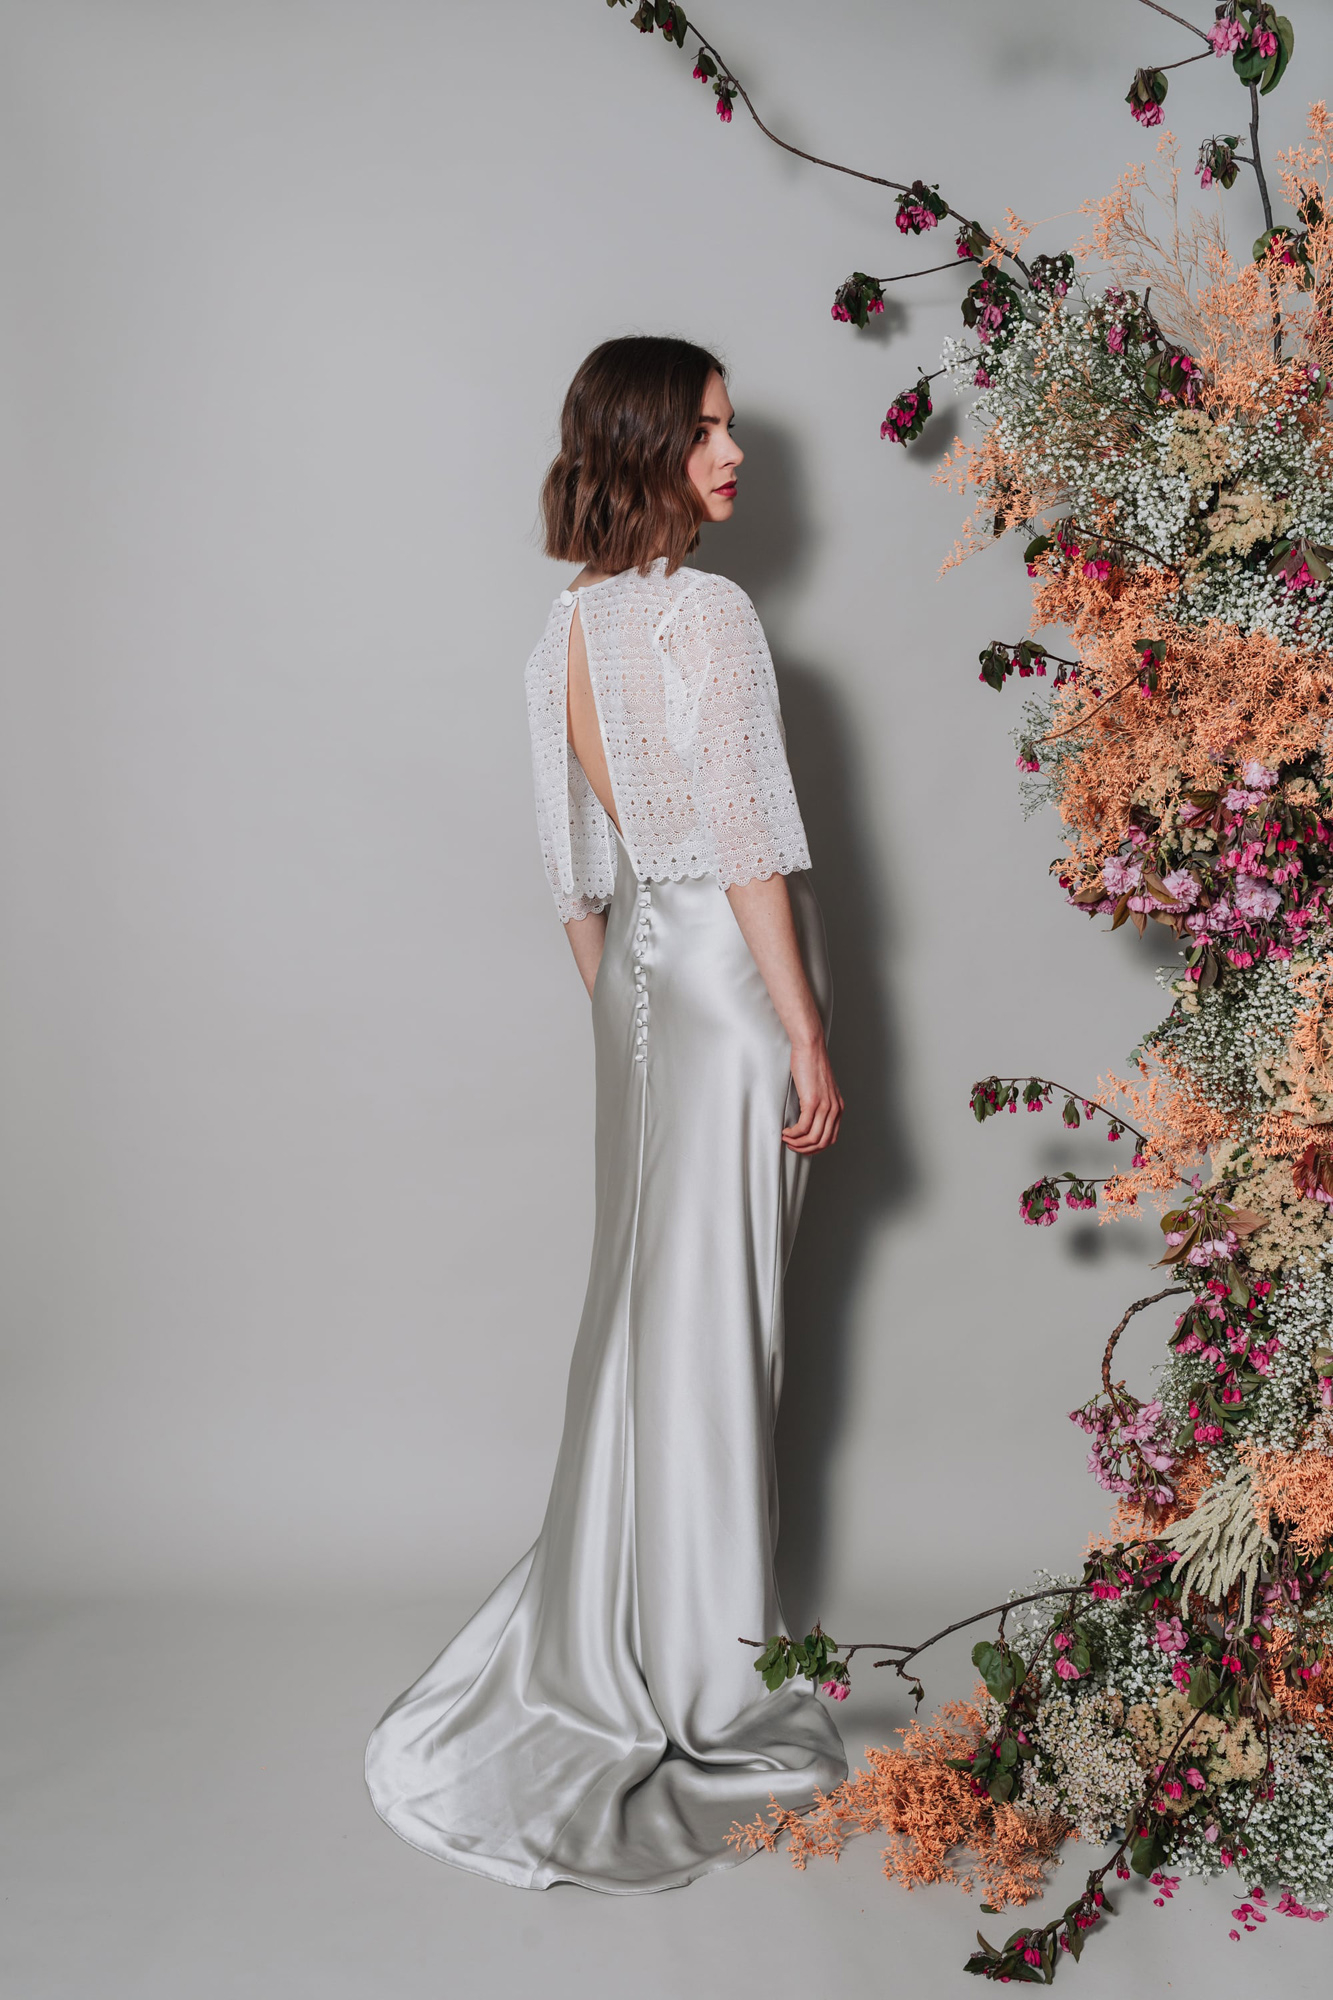 Kate-Beaumont-Sheffield-Freesia-Guipure-Lace-Jacket-Cosmos-Bias-Cut-Silver-Silk-Wedding-Gown-7.jpg